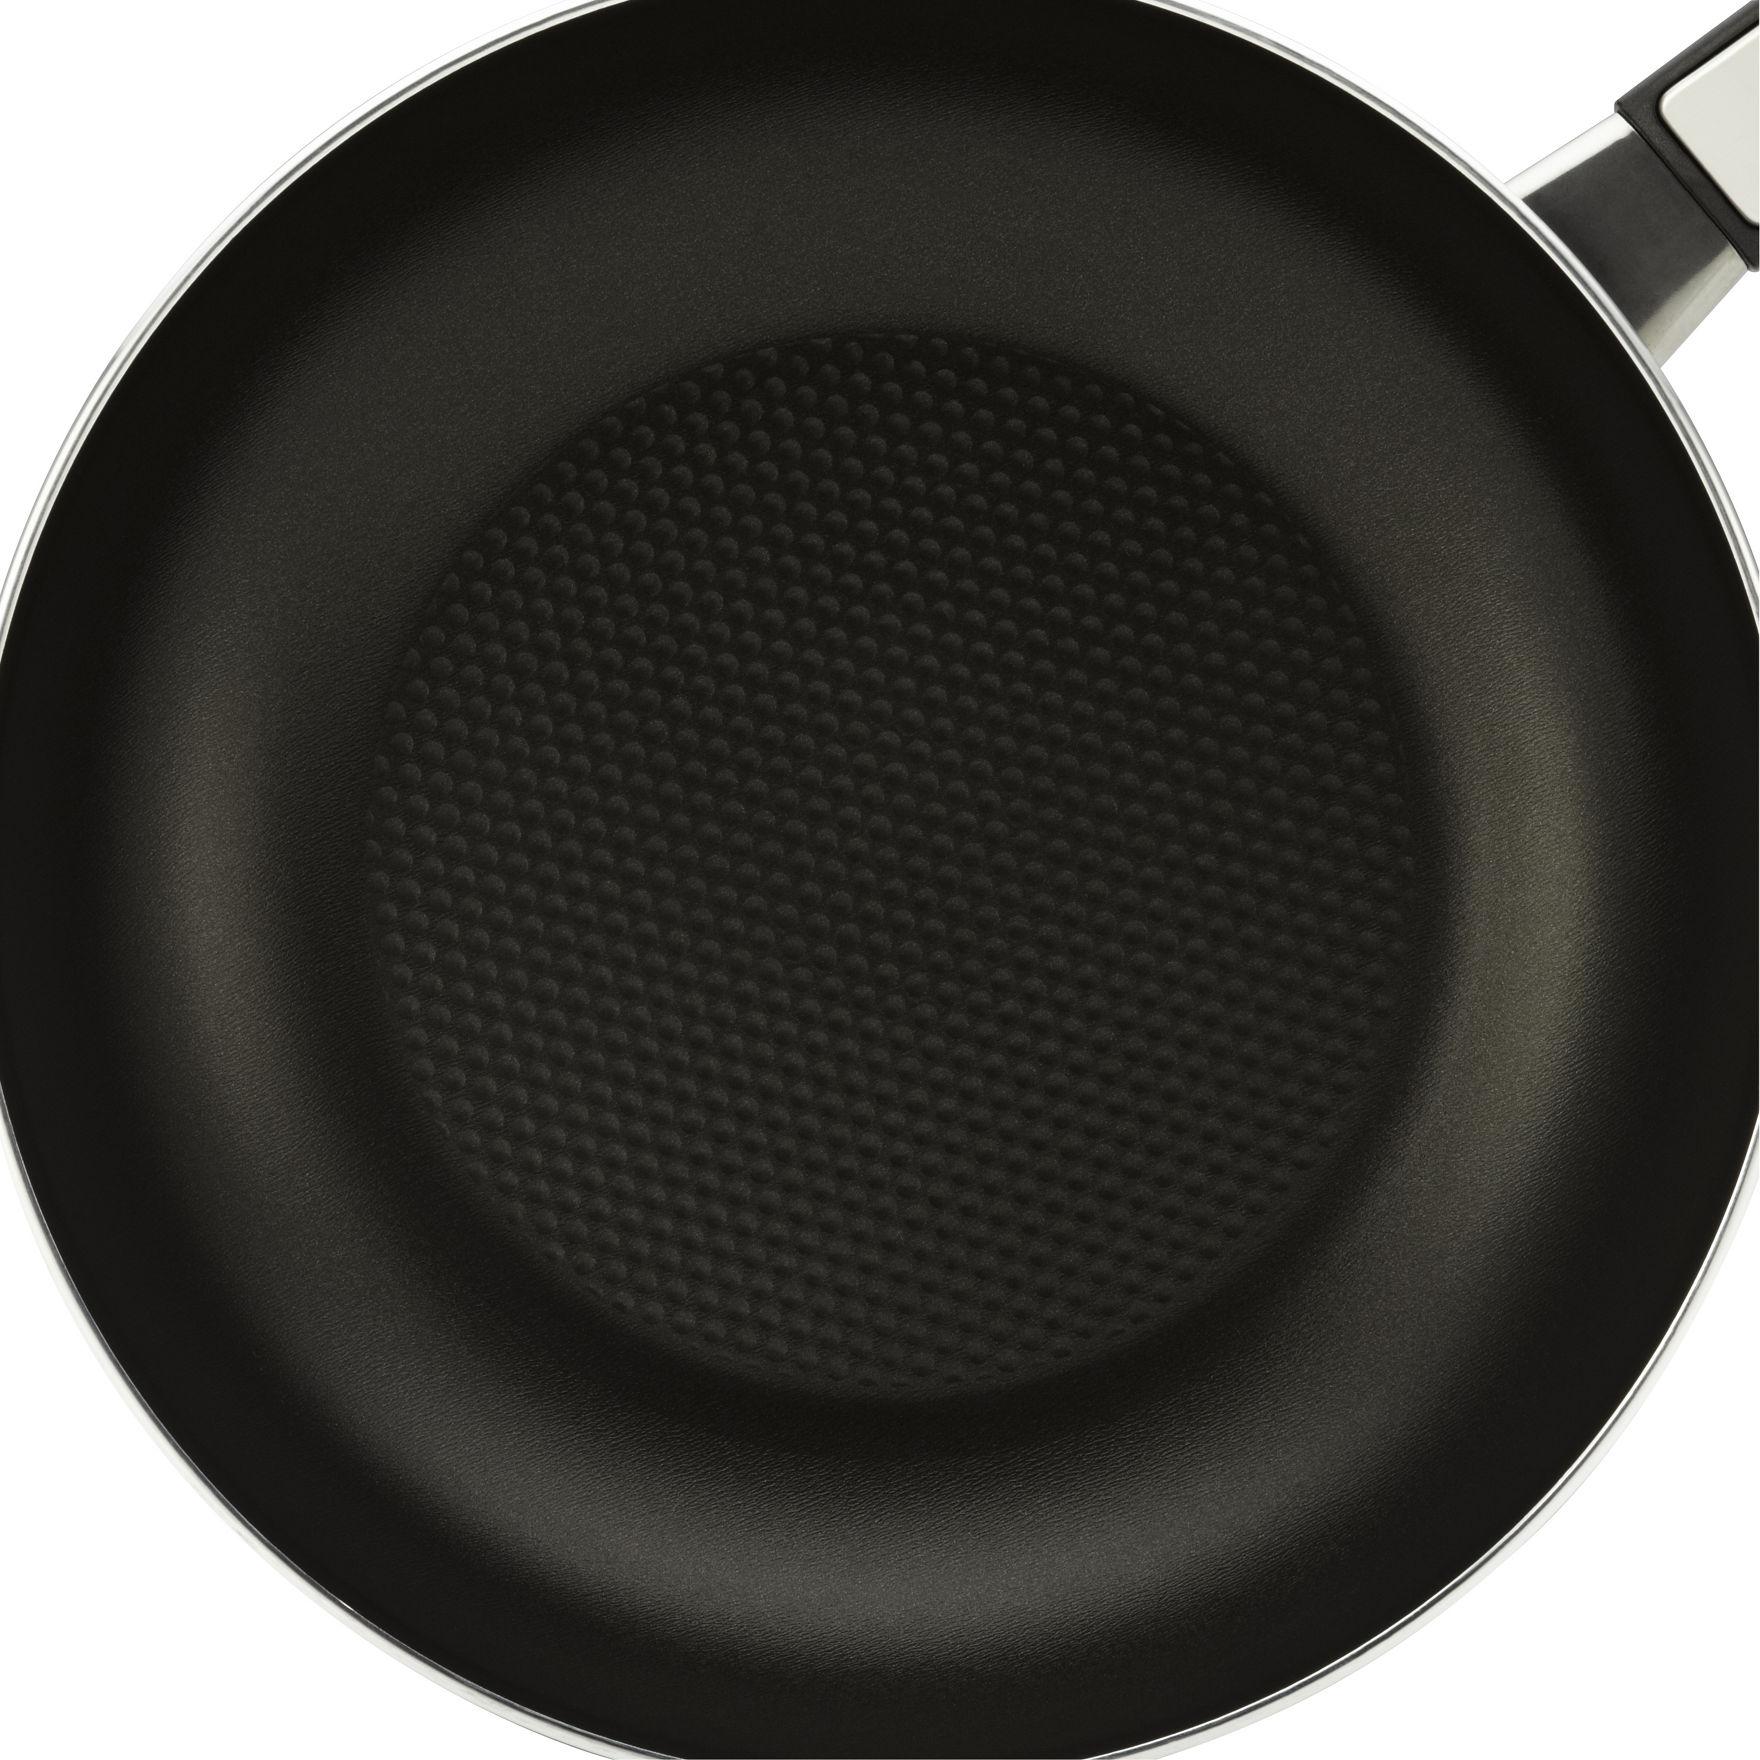 Farberware Aqua Frying Pans & Skillets Cookware